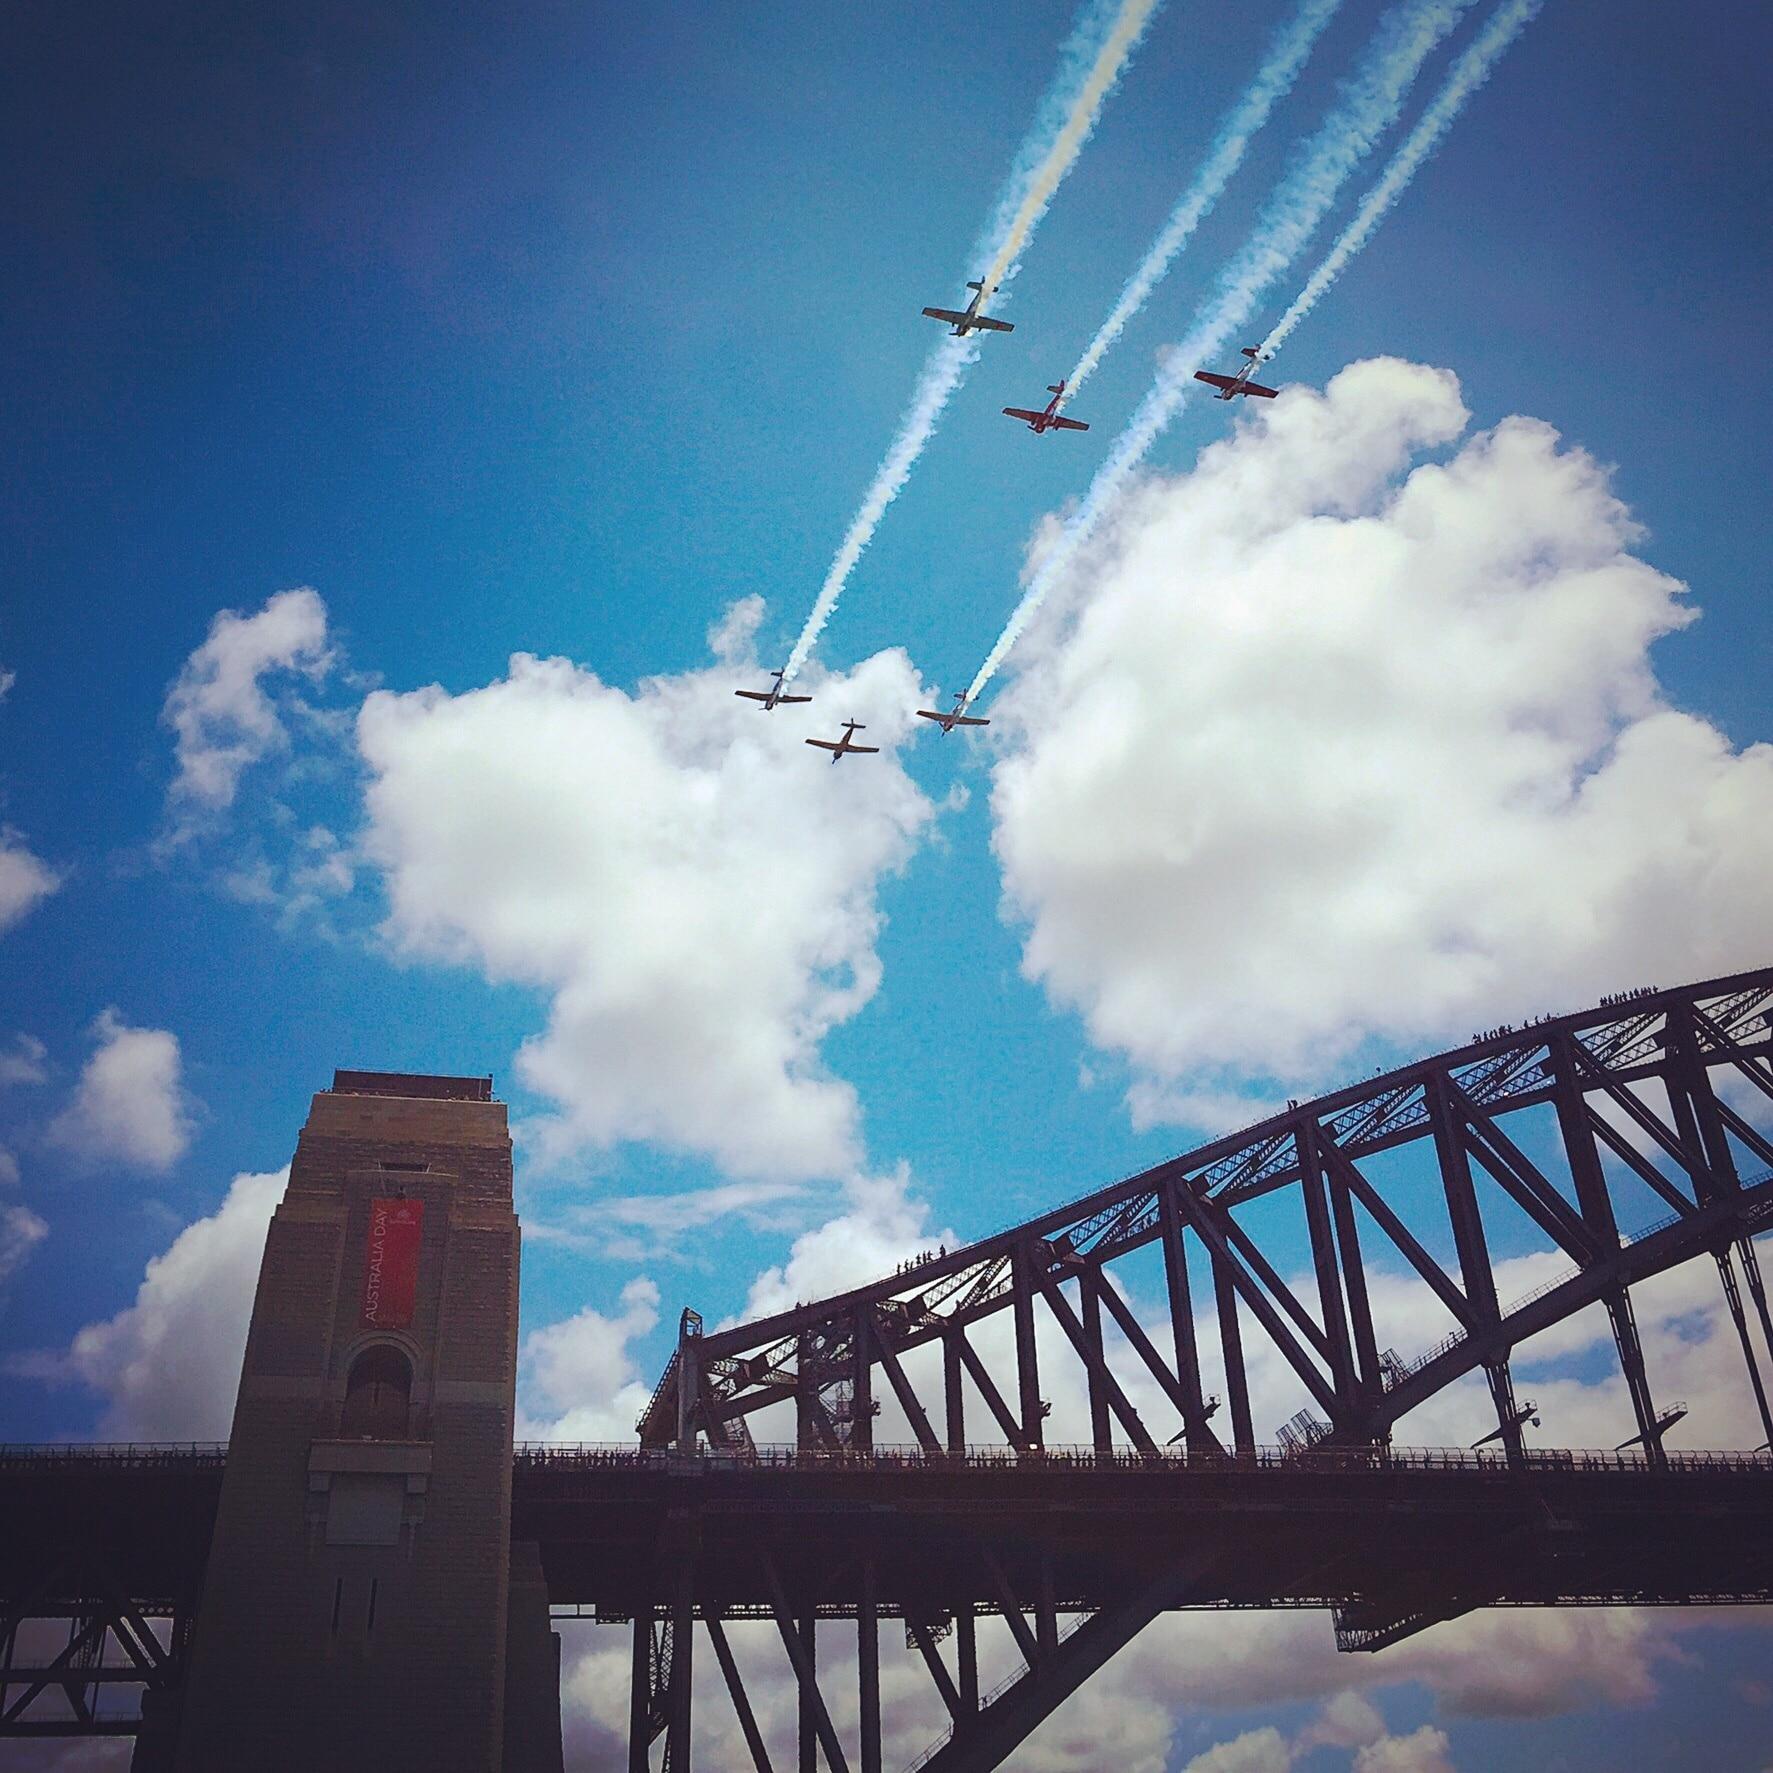 Rozelle, Sydney, New South Wales, Australia